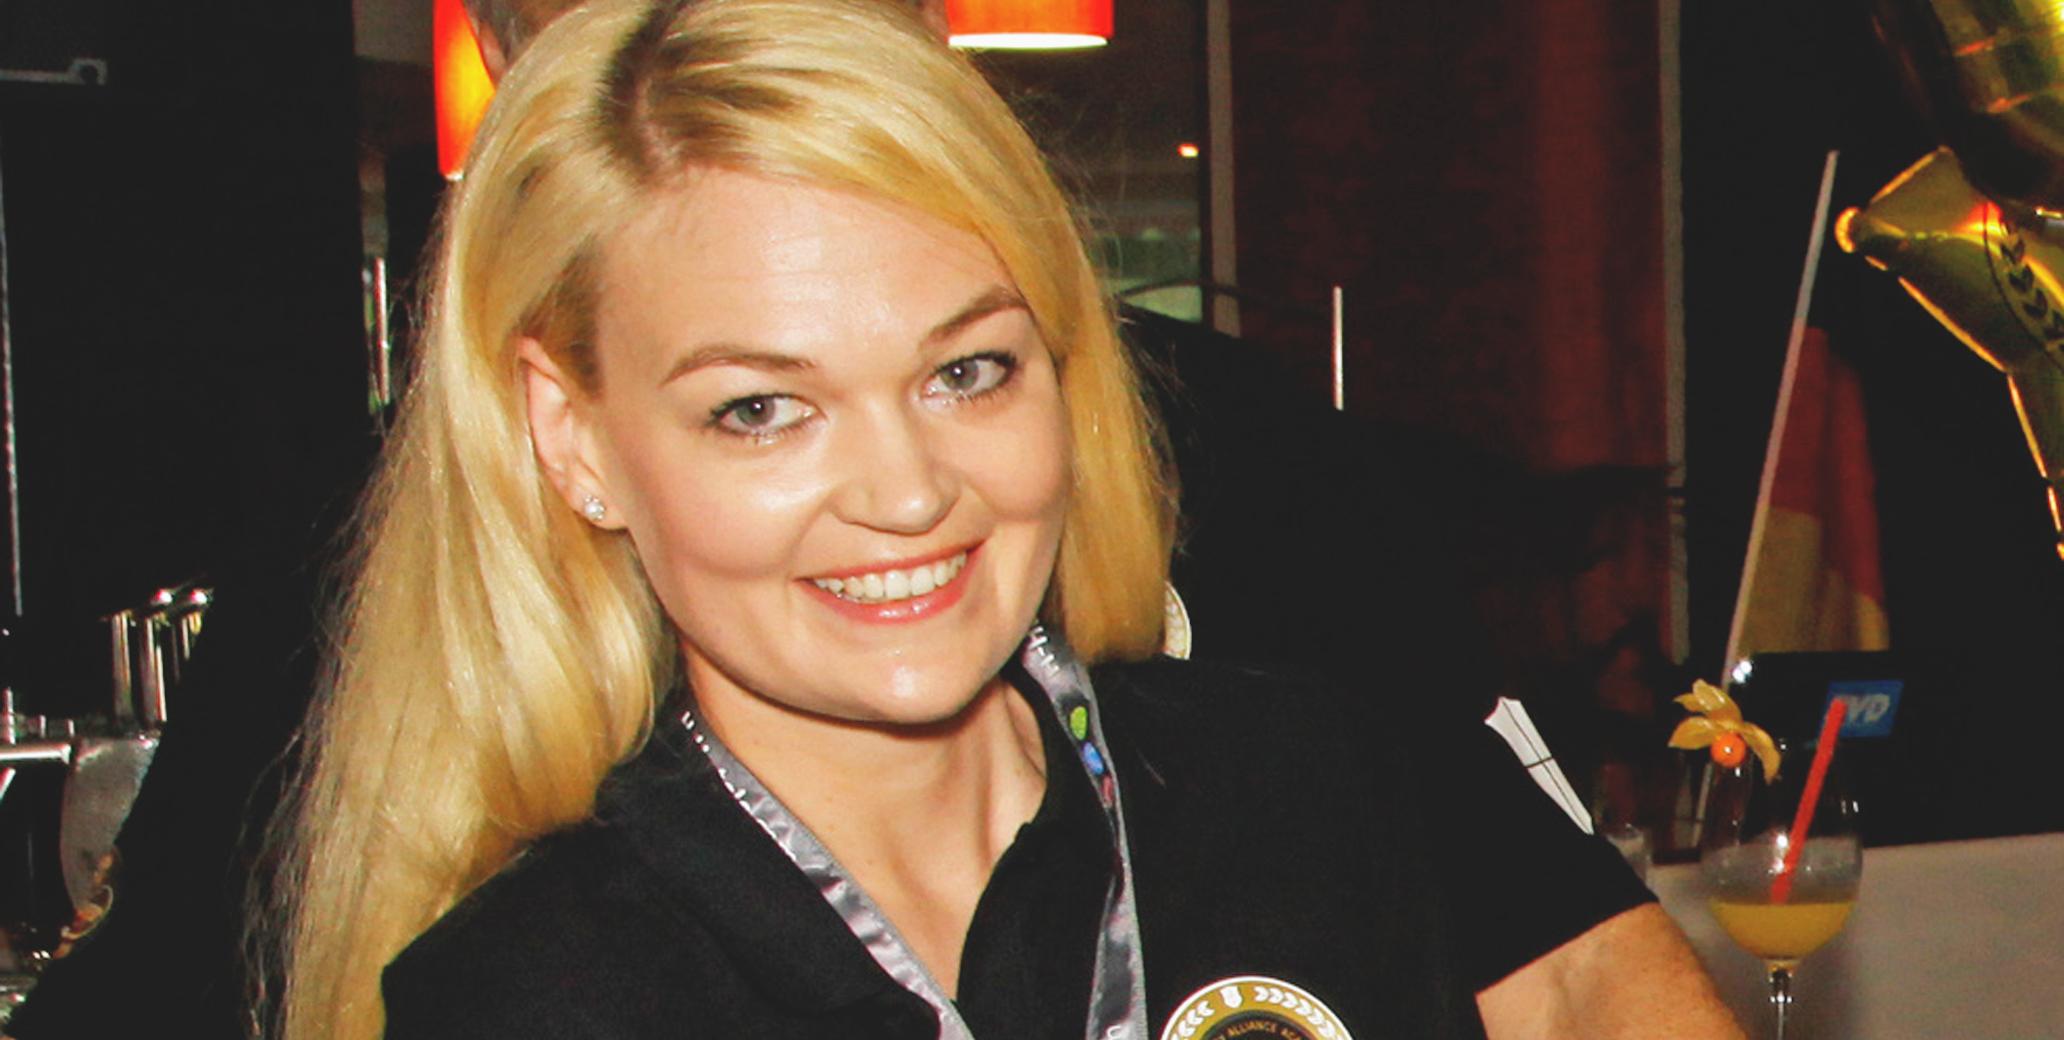 Human Resources - Teresa S. | Senior Corporate Trainer